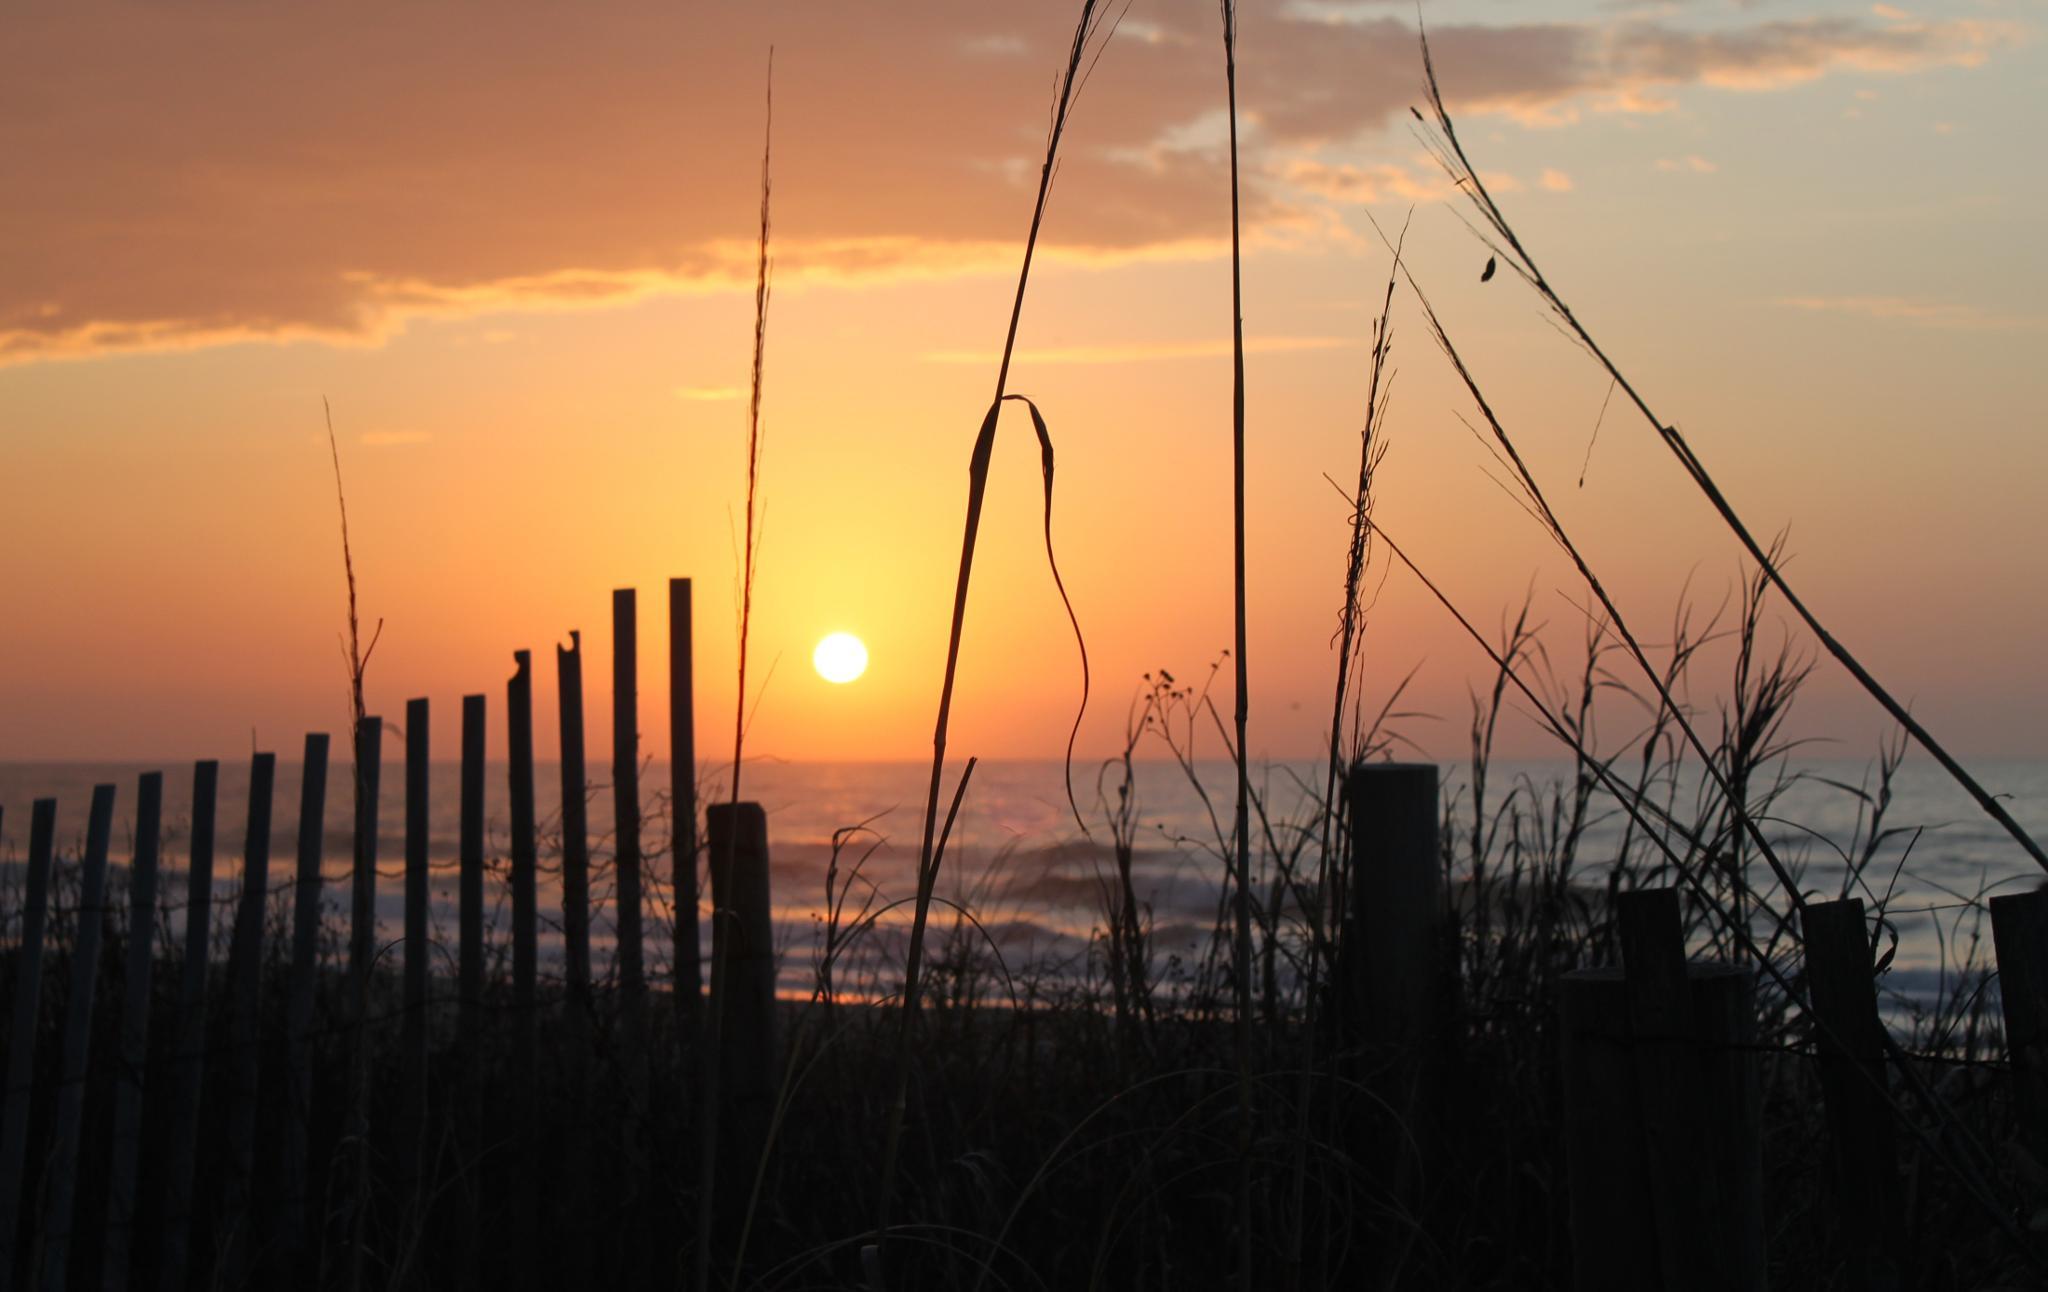 Sunrise at Myrtle Beach, South Carolina by Lisa Marshall Moore